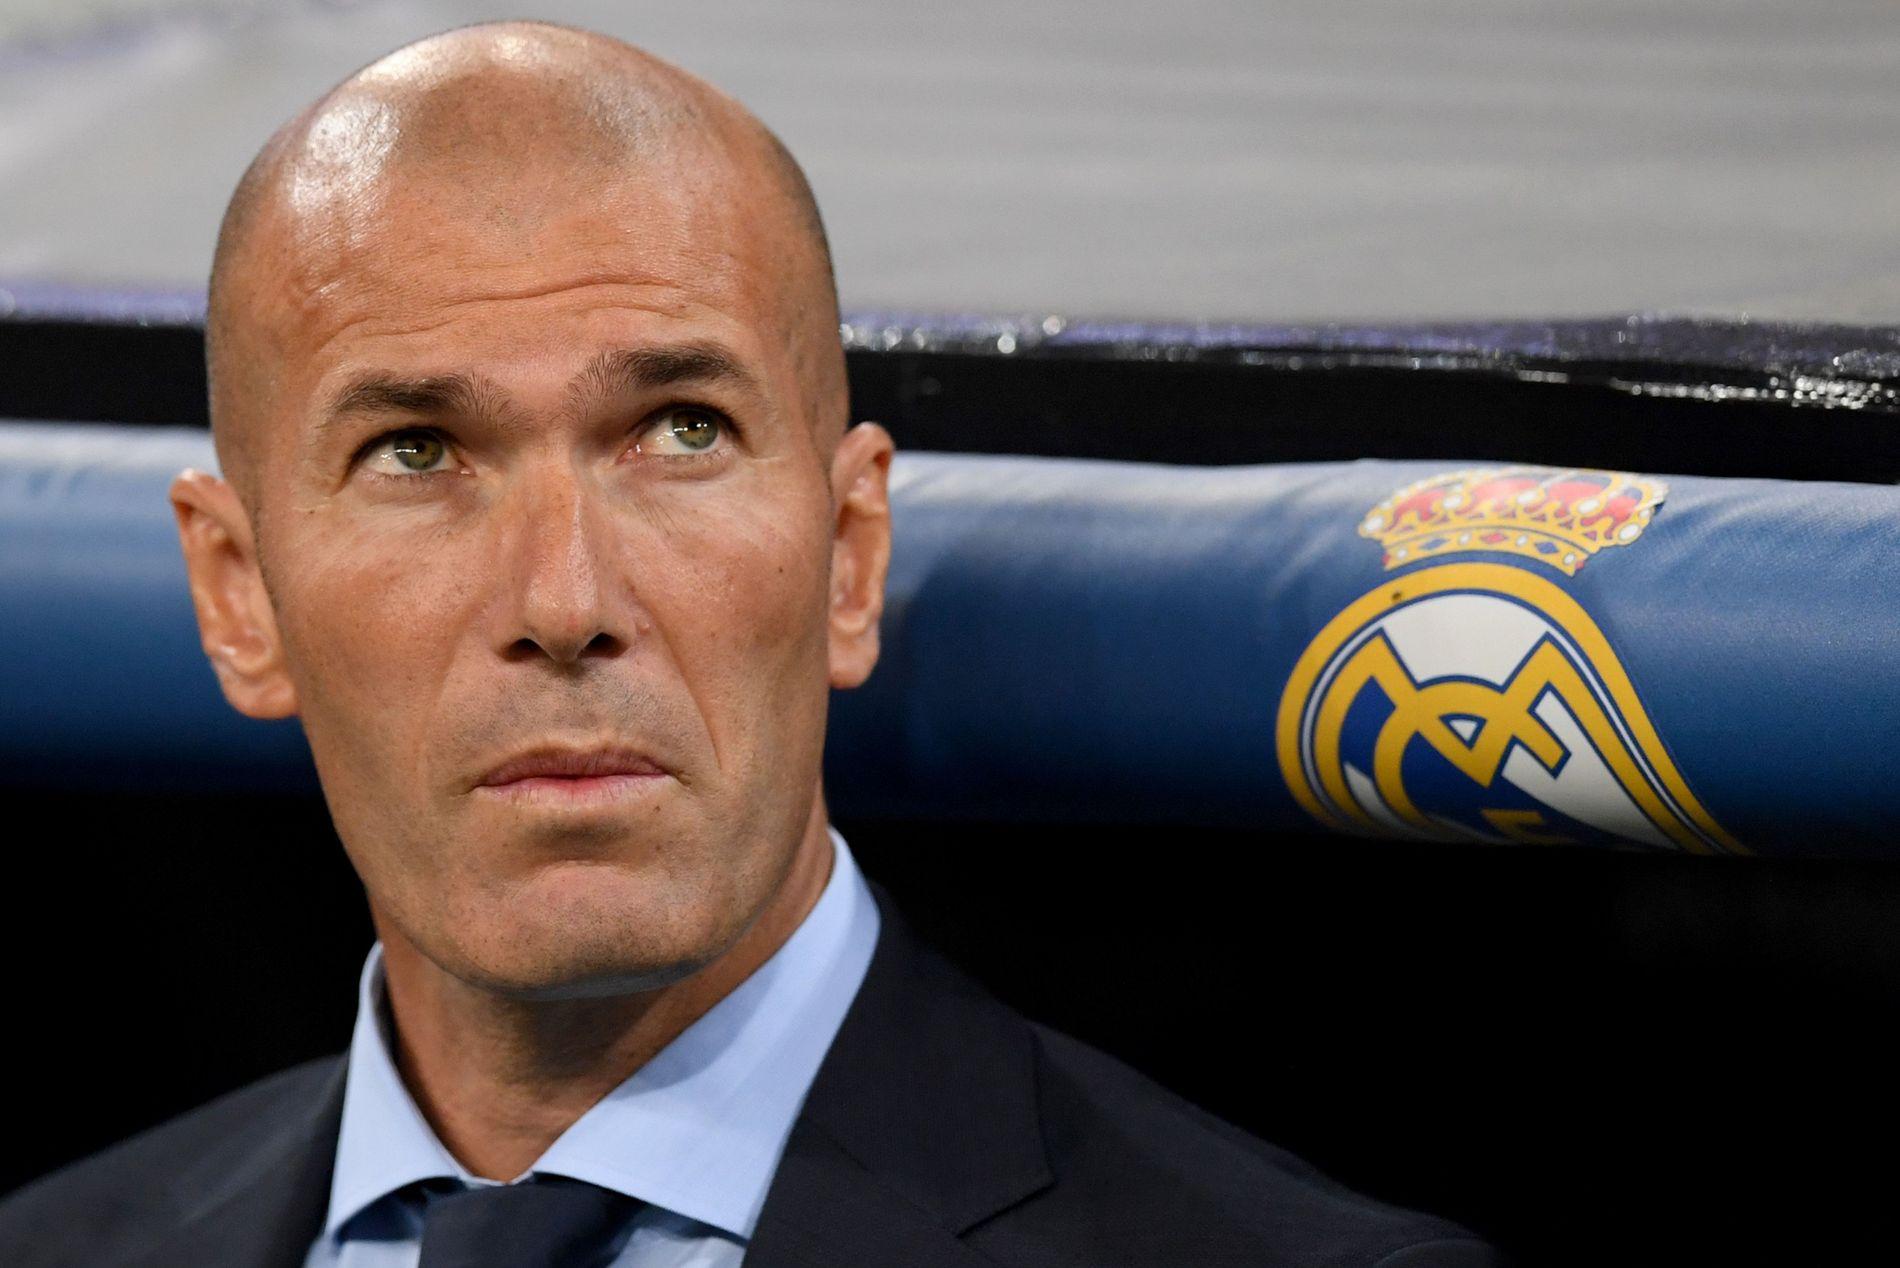 LITT HODEBRY: Real Madrid-sjef Zinedine Zidane virker komfortabel tross at laget aldri har vunnet borte mot Borussia Dortmund i Champions League.